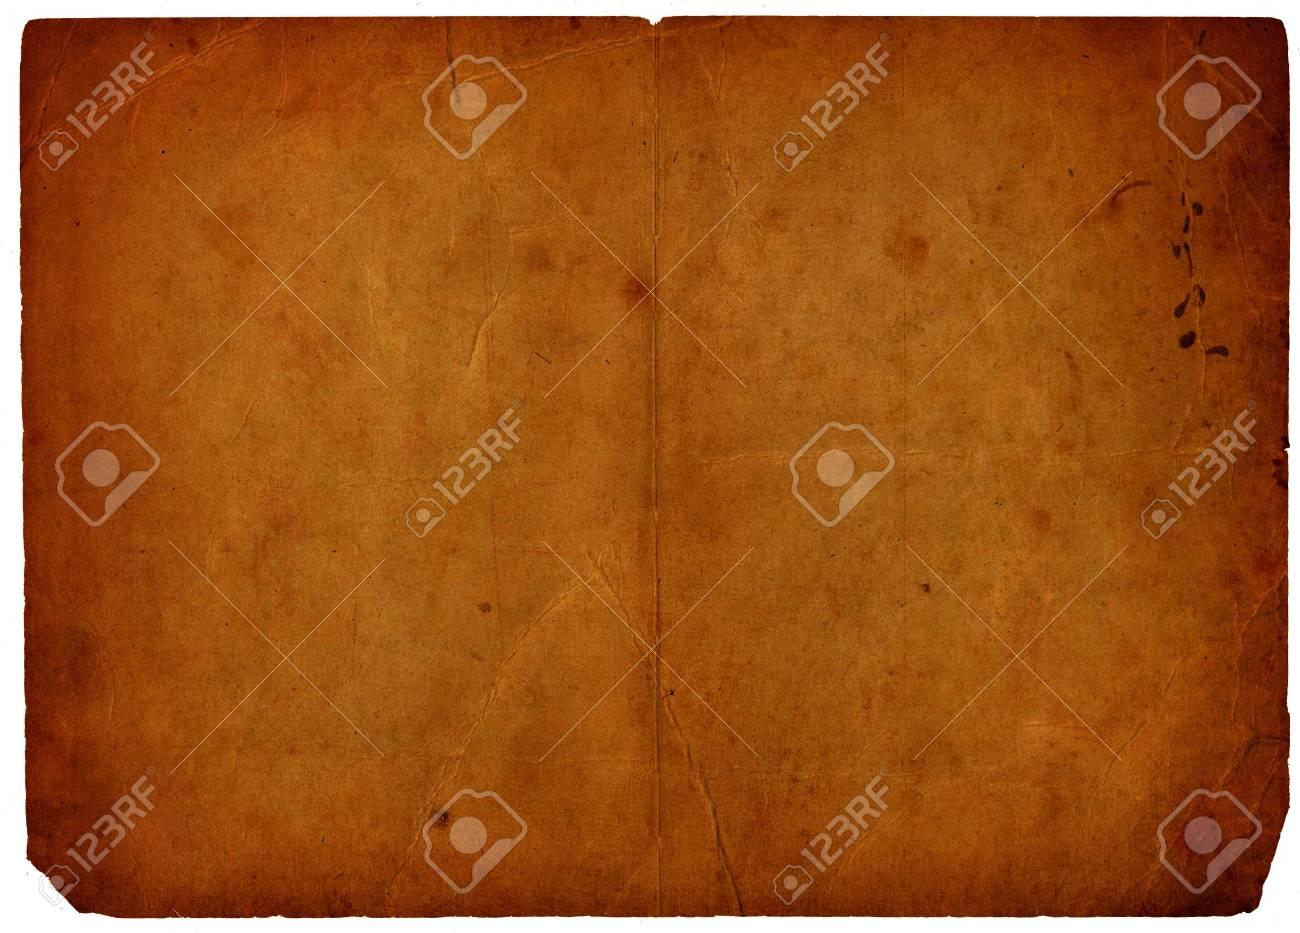 grunge notebook Stock Photo - 6839227